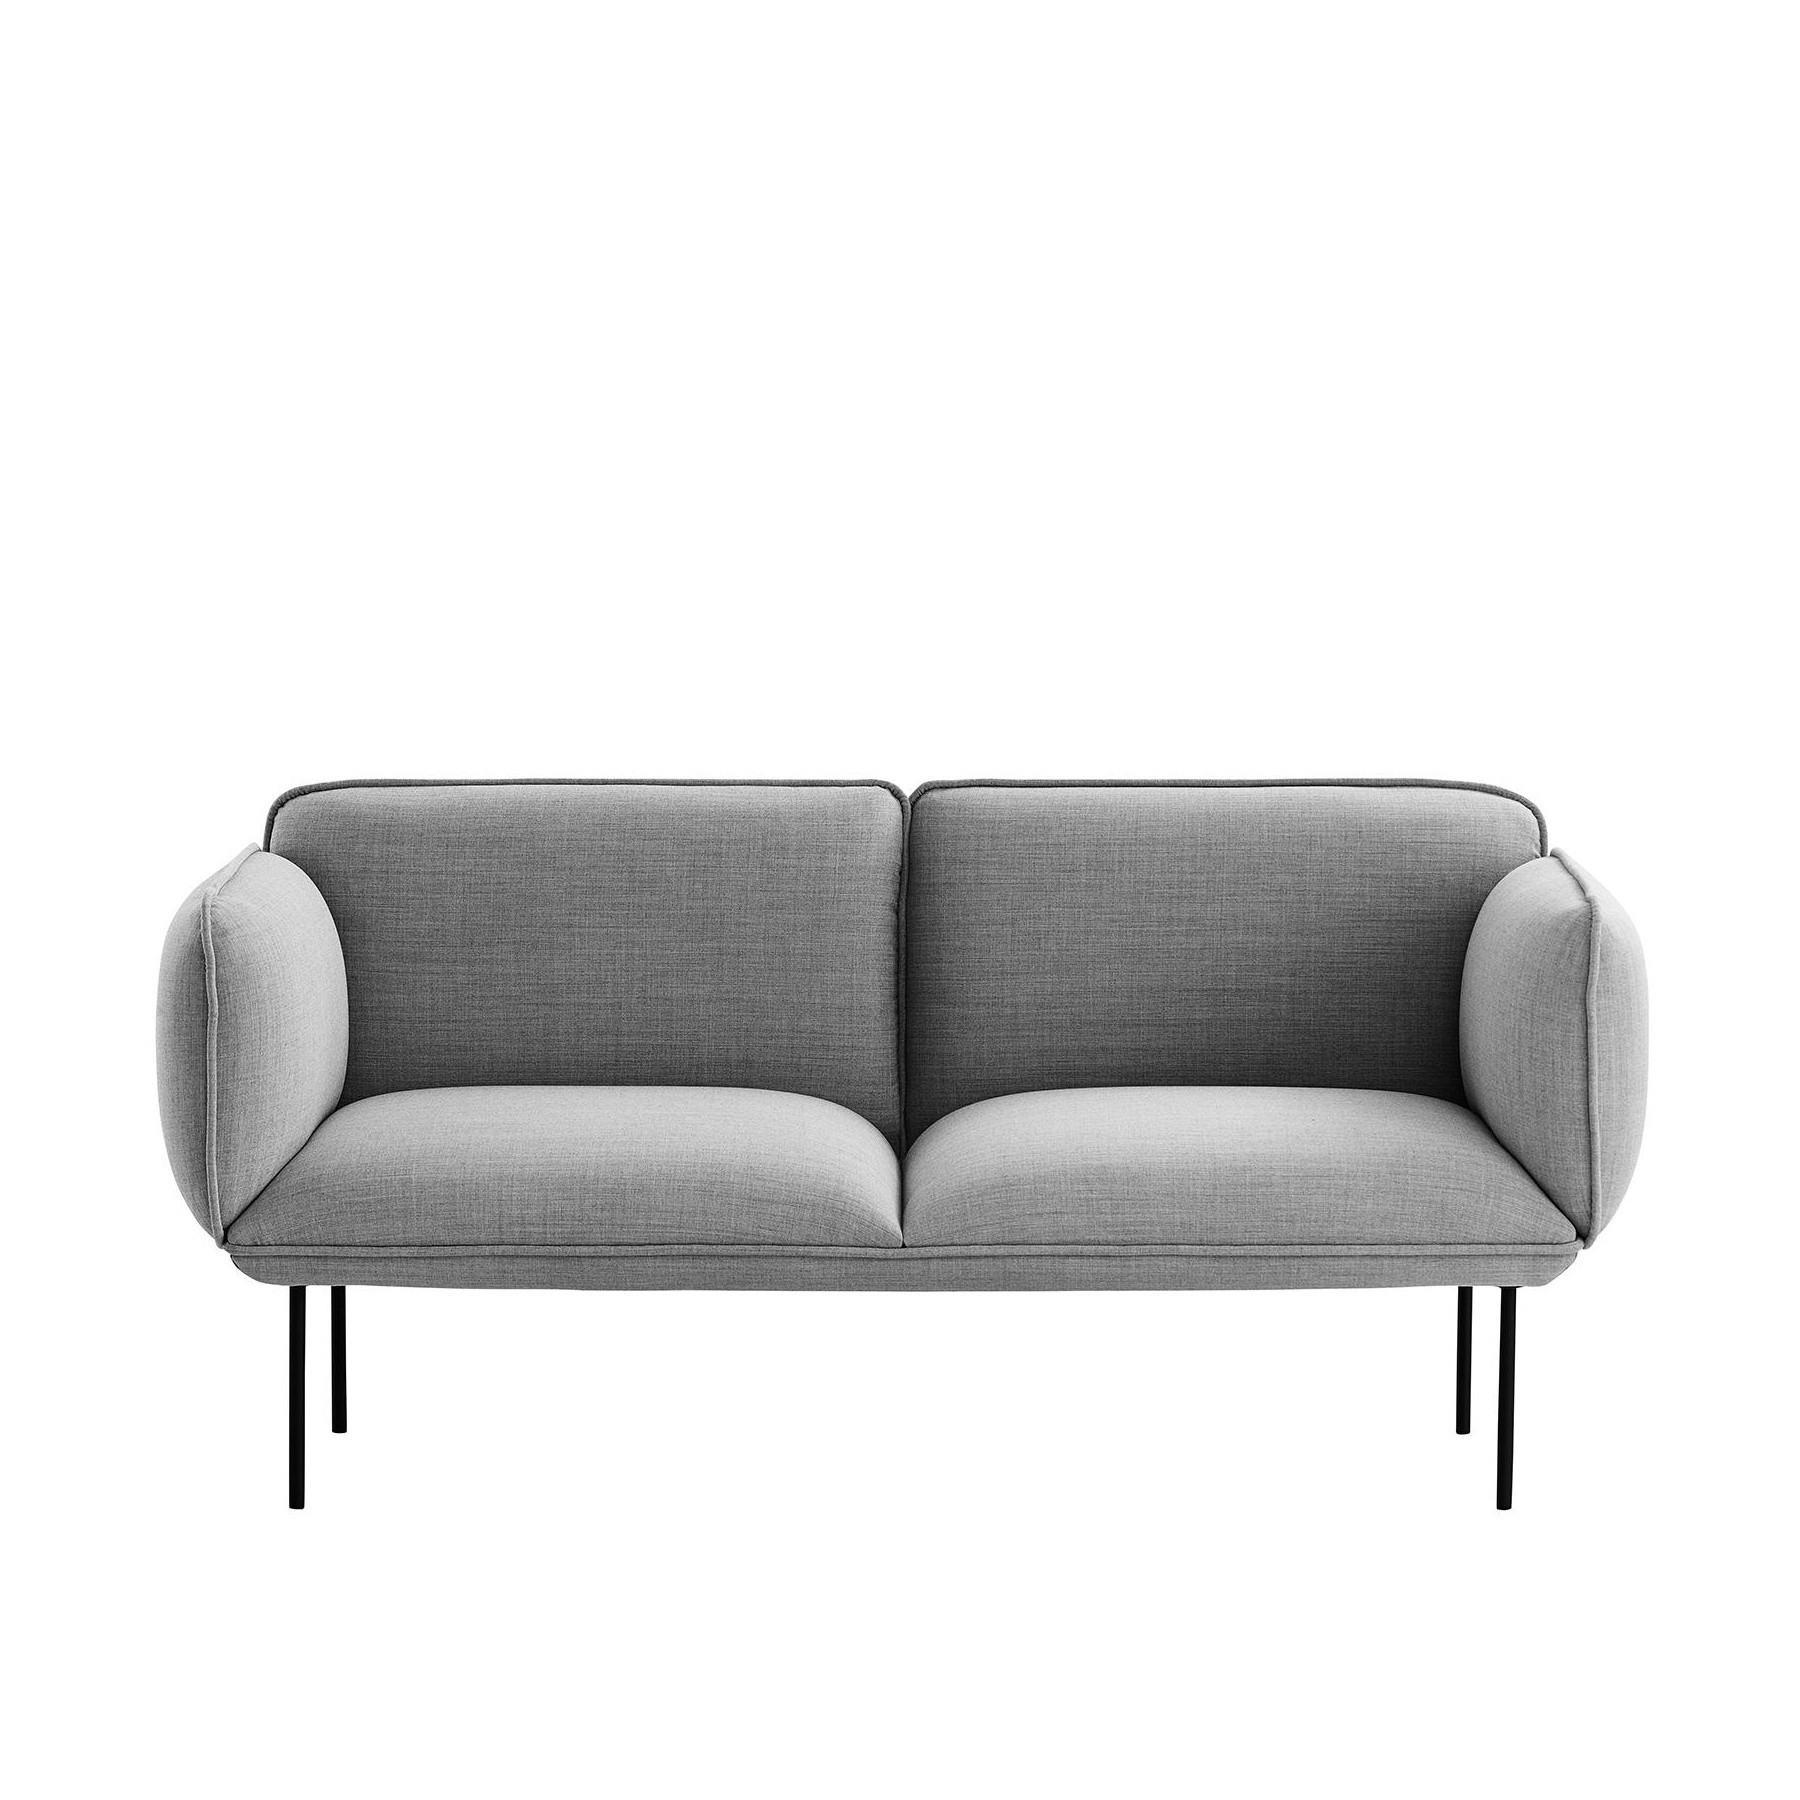 Nakki 2-Seater Fabric Sofa